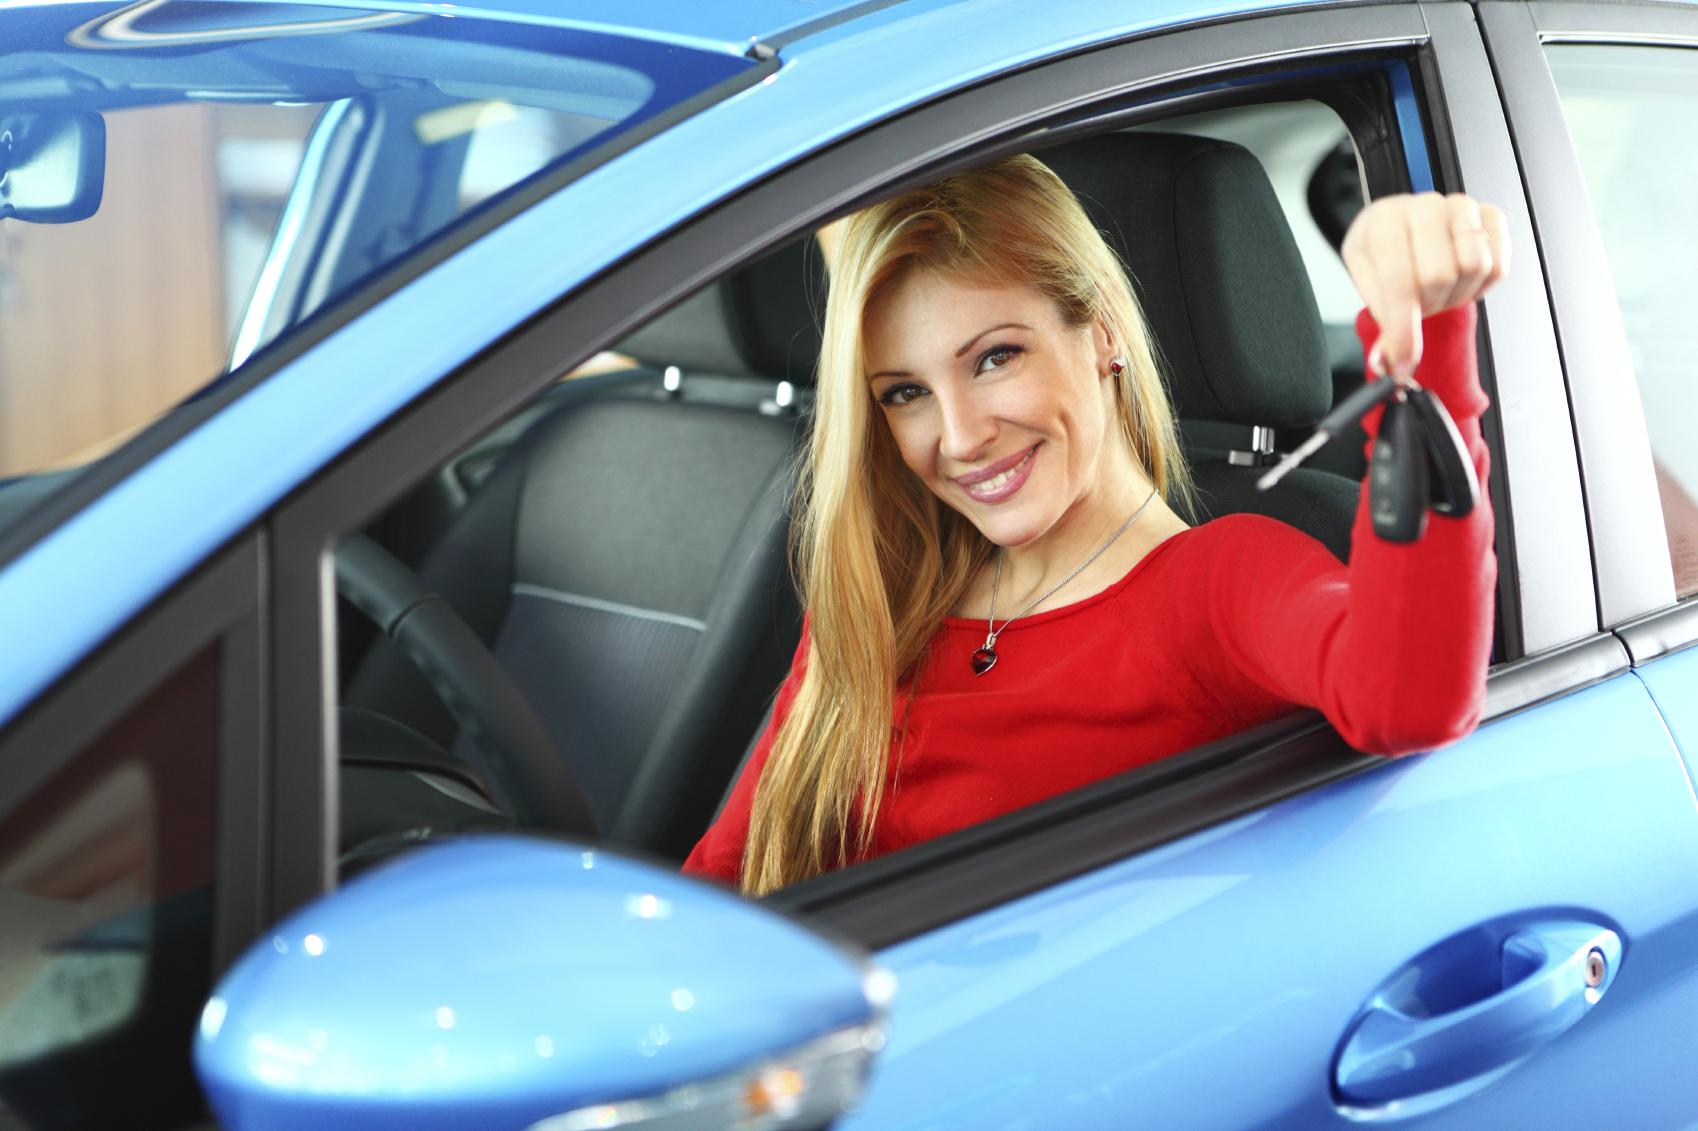 Honda Care Extended Warranty In Sea Girt, NJ